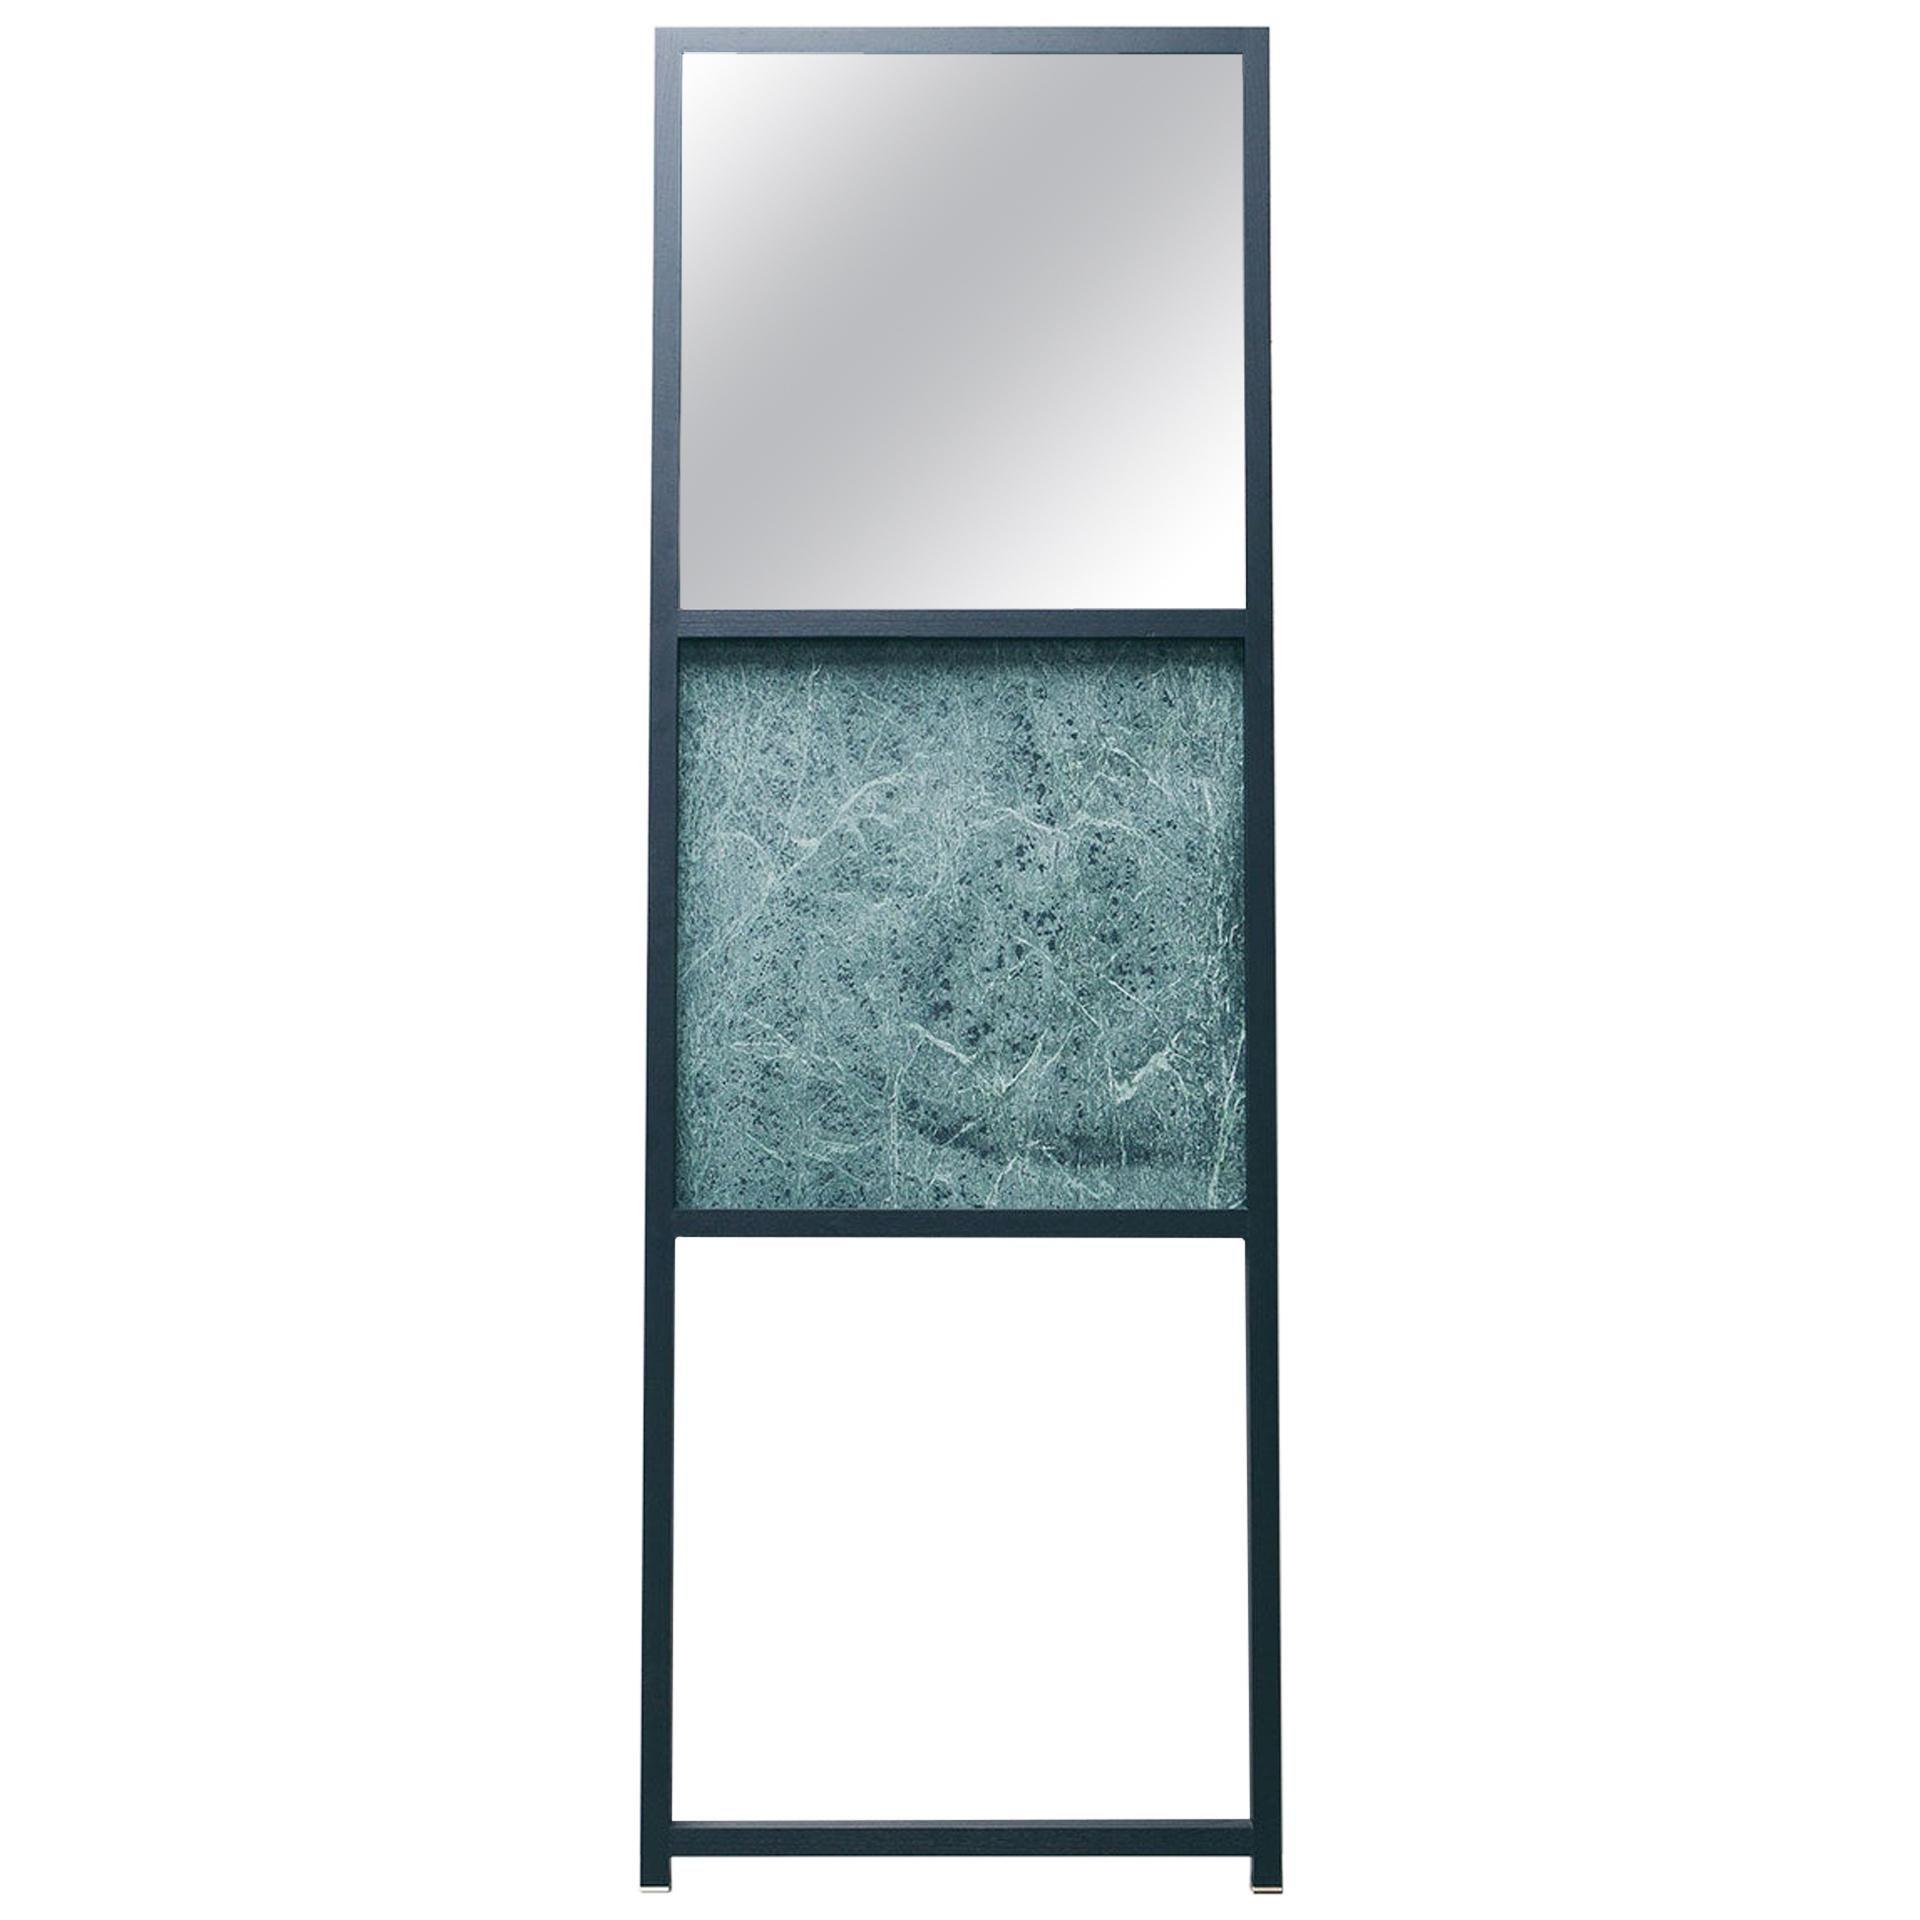 contemporary marble mirror, mirror 01.1 by barh